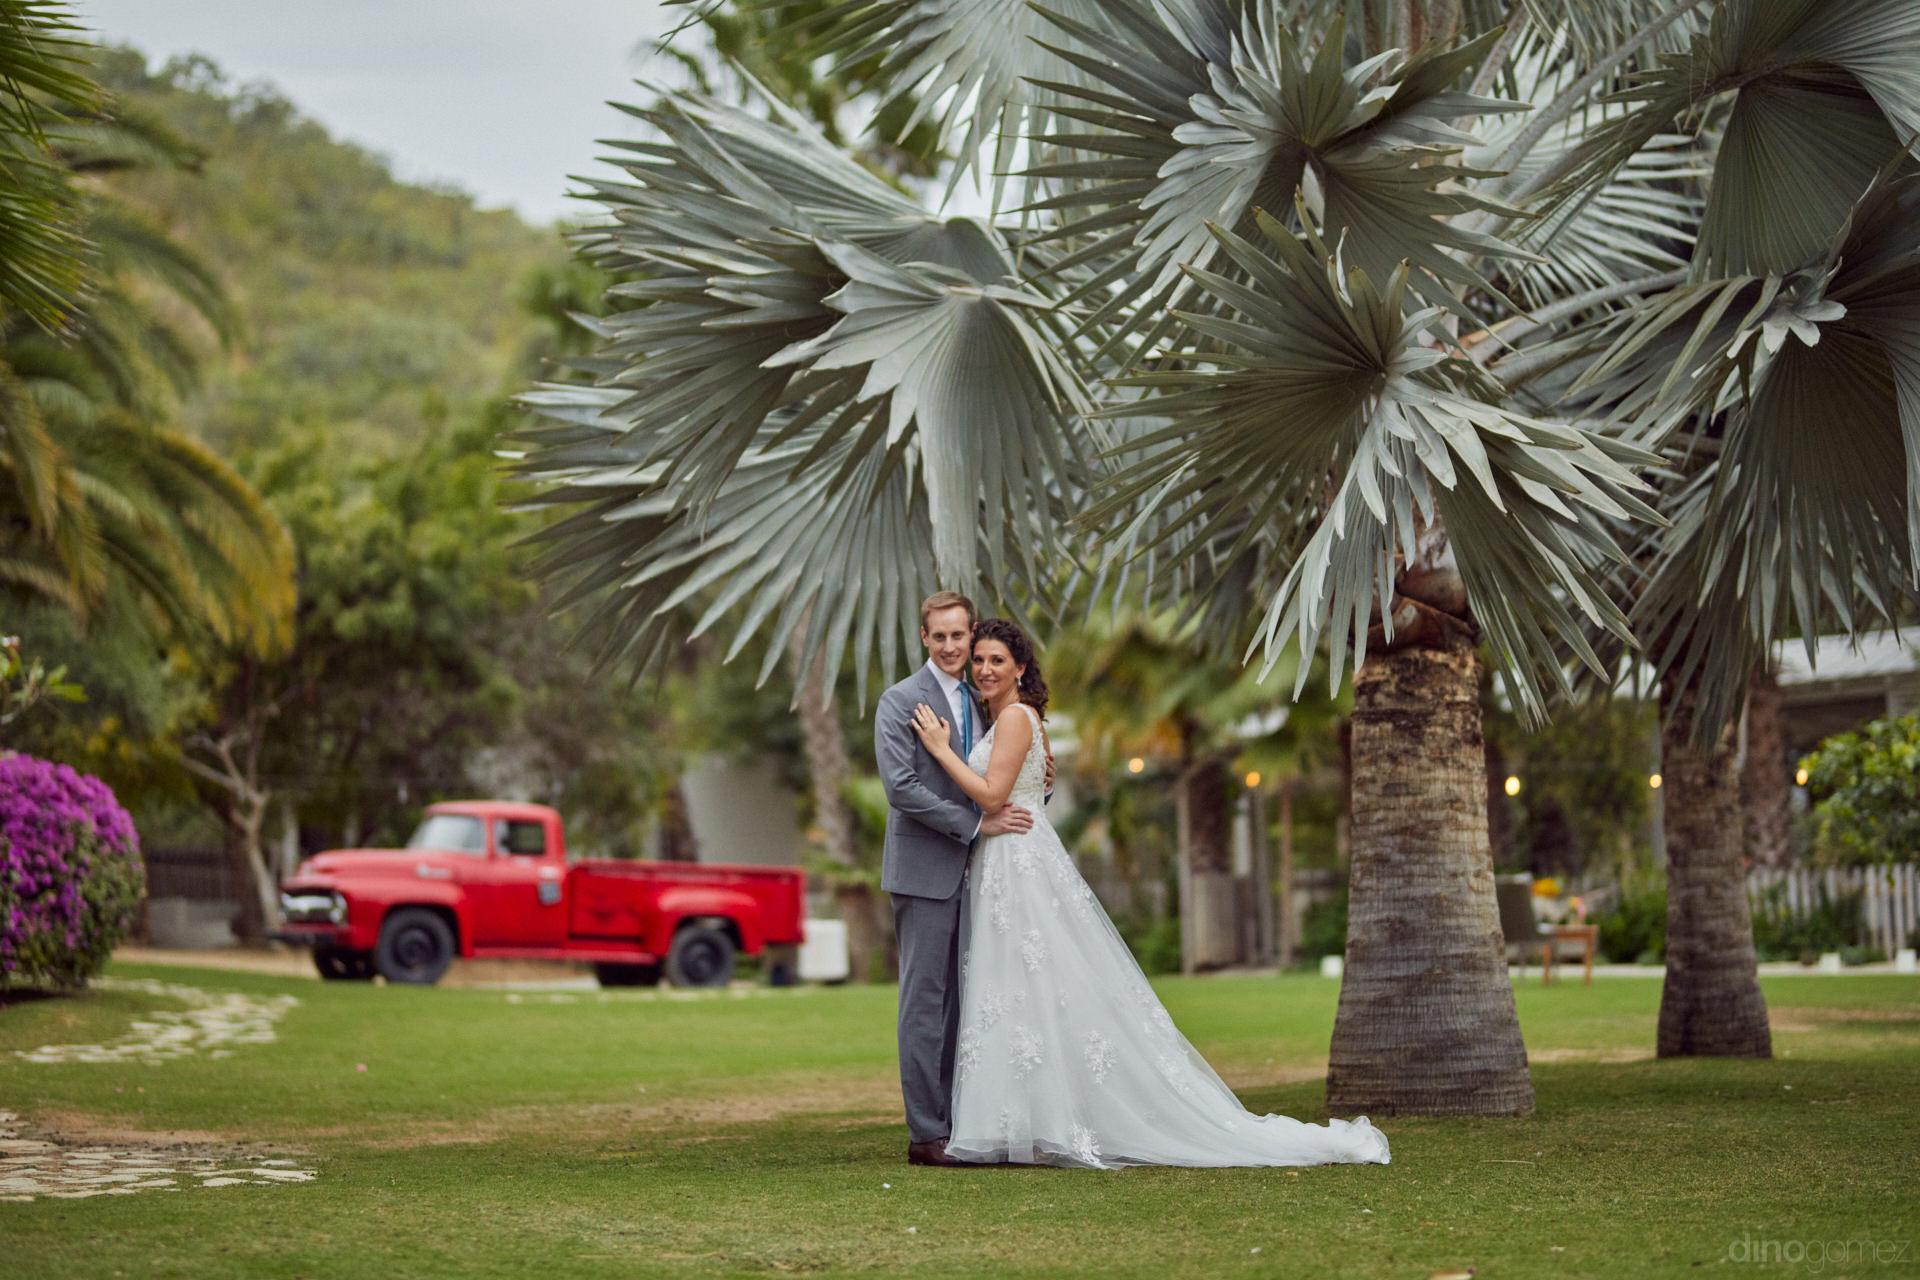 Wedding Planner In Cabo San Lucas - Hilary & Bryan Flora Wedding